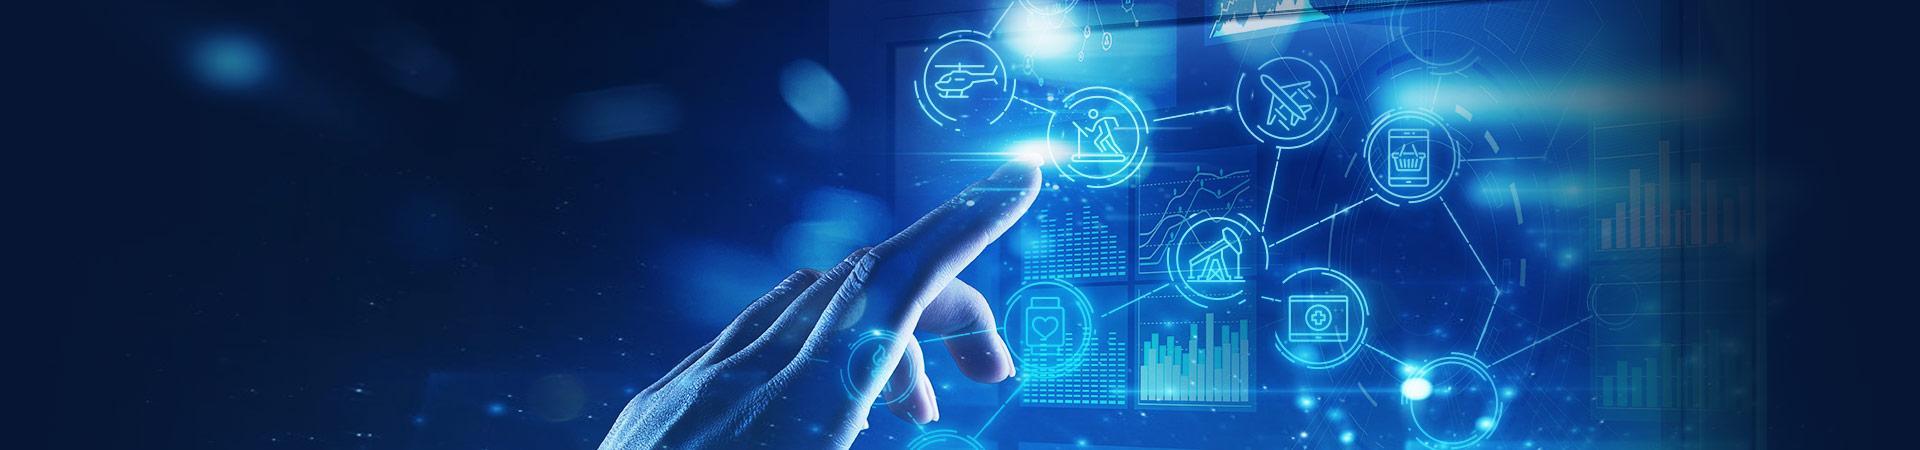 Intelligent Display and Computing DMS